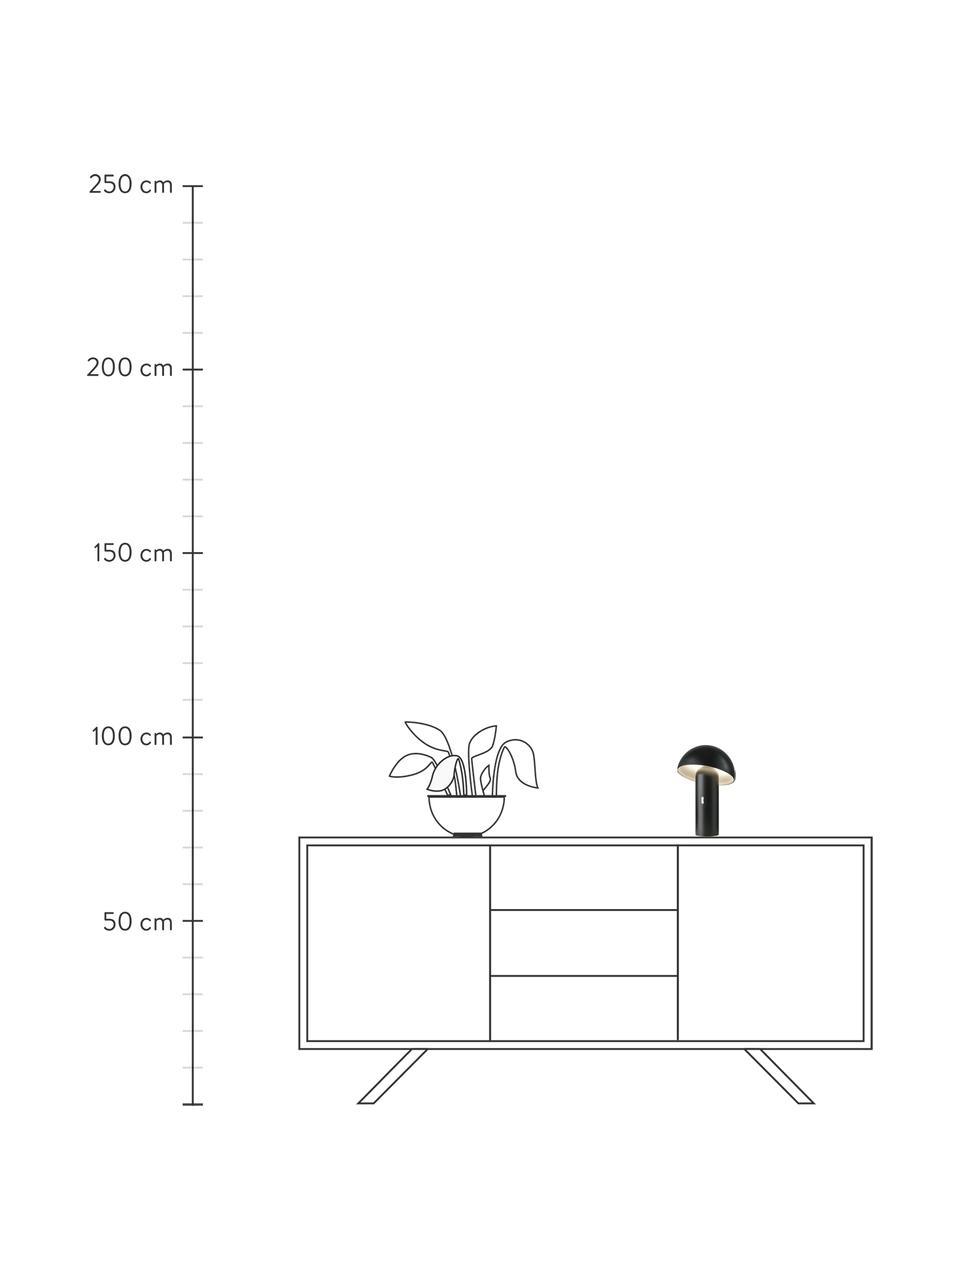 Kleine Mobile Dimmbare Tischlampe Svamp, Lampenschirm: Kunststoff, Lampenfuß: Kunststoff, Schwarz, Ø 16 x H 25 cm